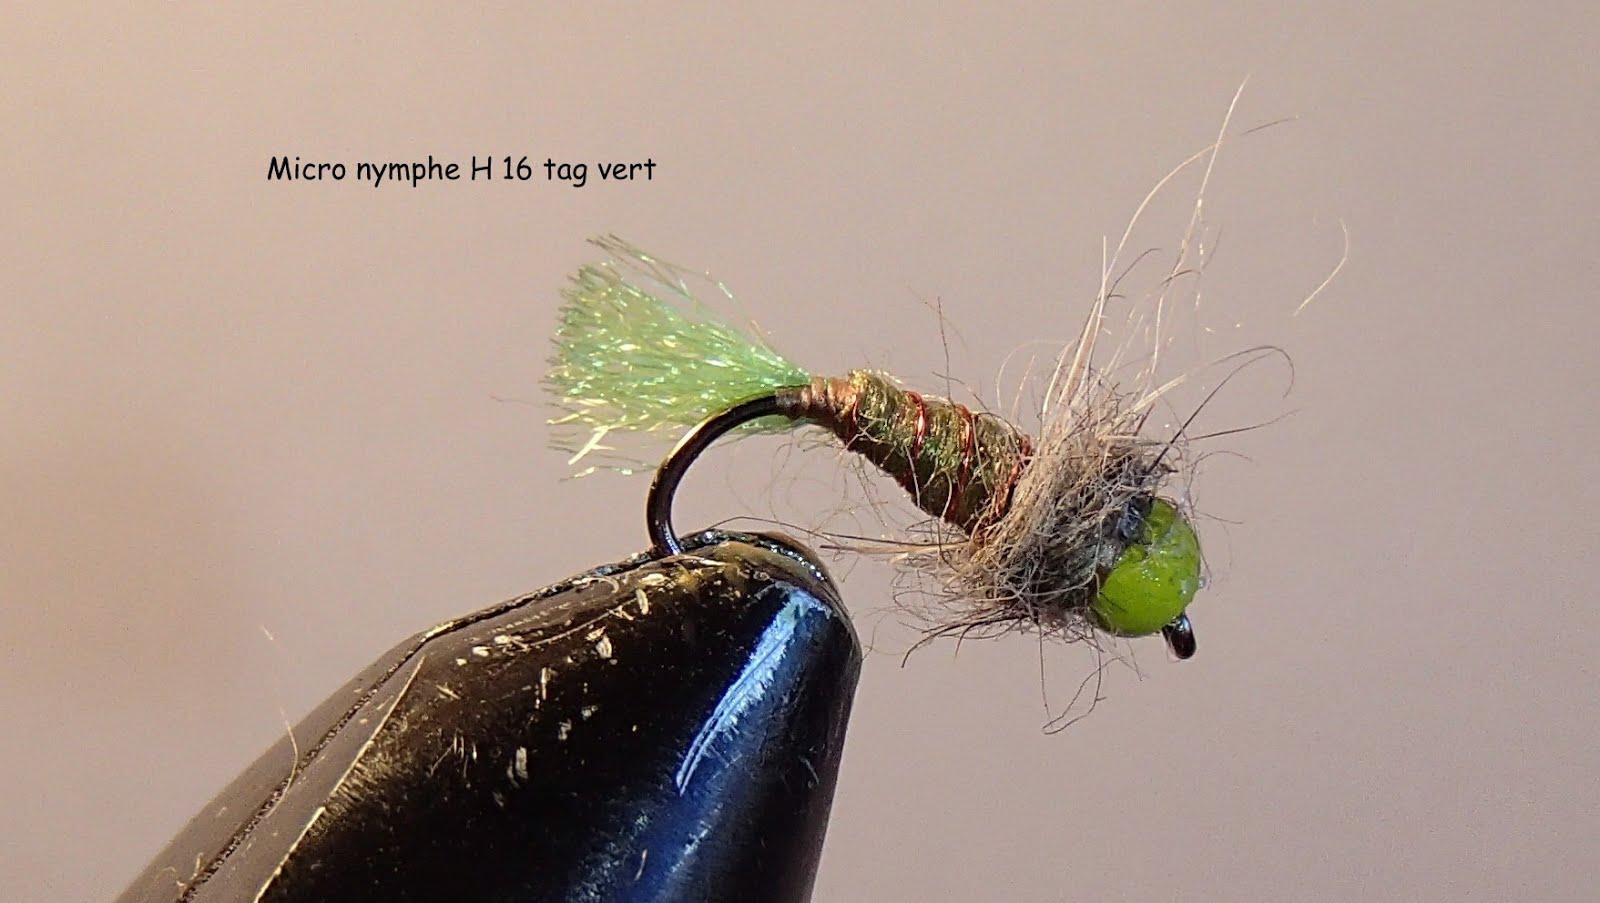 Nymphe tag vert